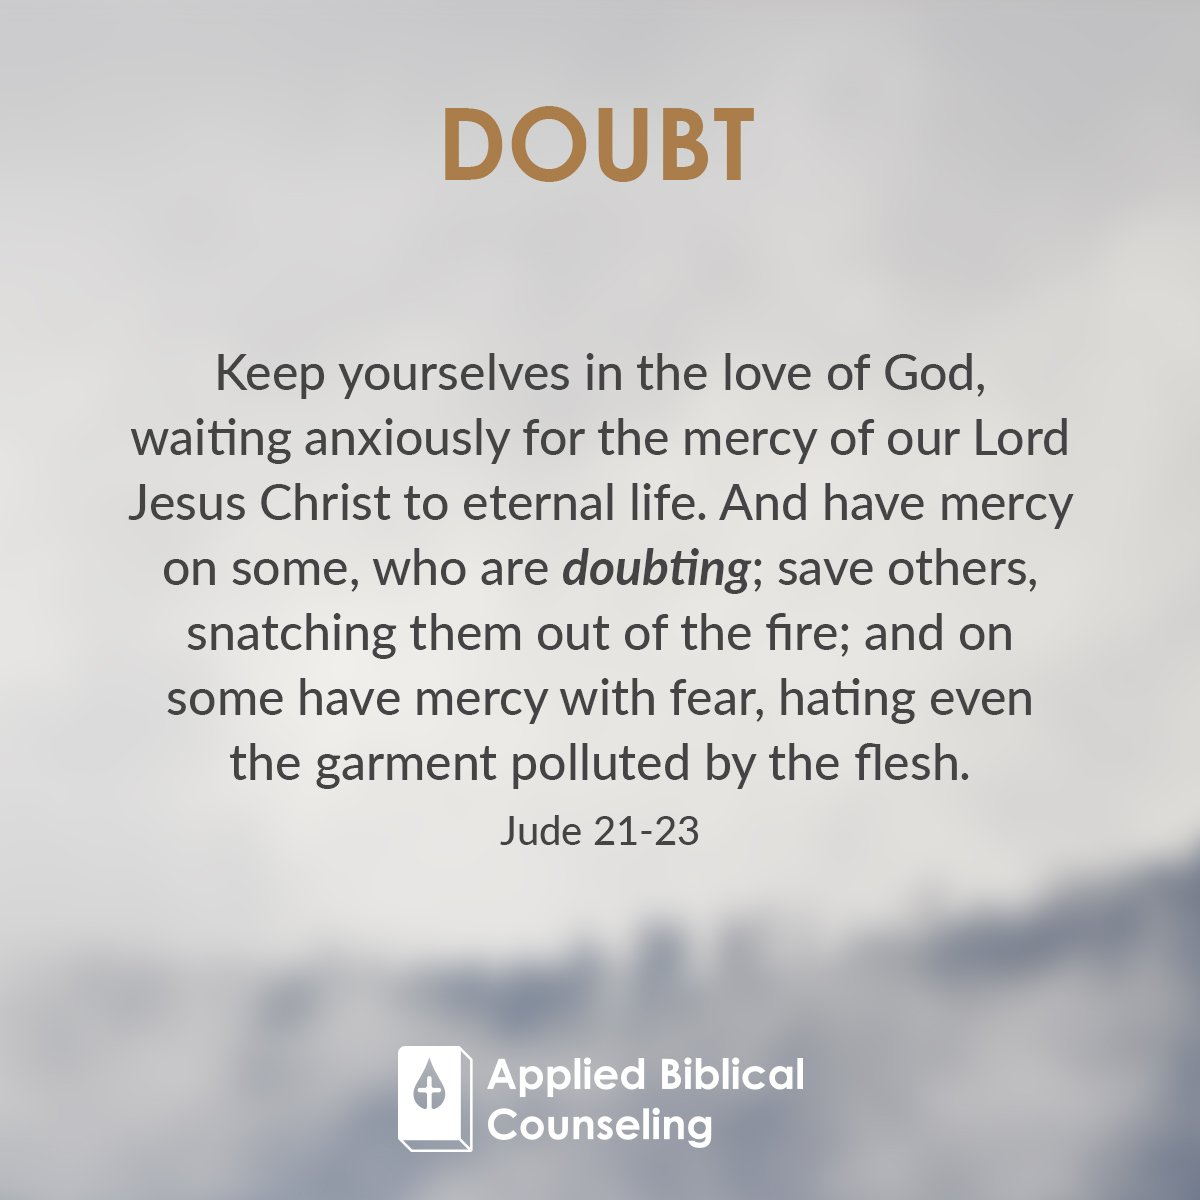 Doubt 5